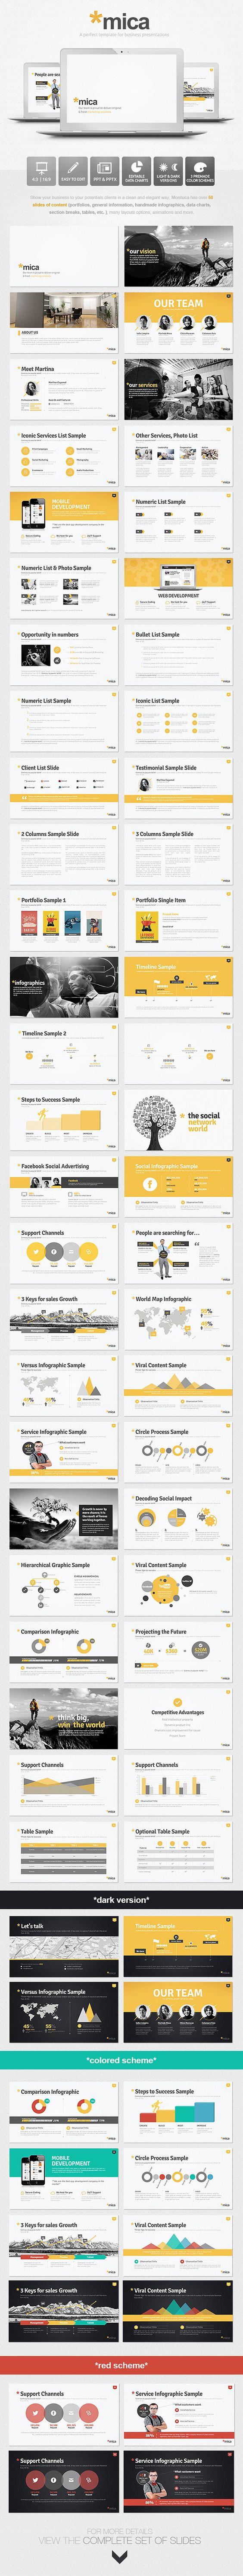 Mica Powerpoint Presentation Template PowerPoint Template / Theme / Presentation / Slides / Background / Power Point #powerpoint #template #theme